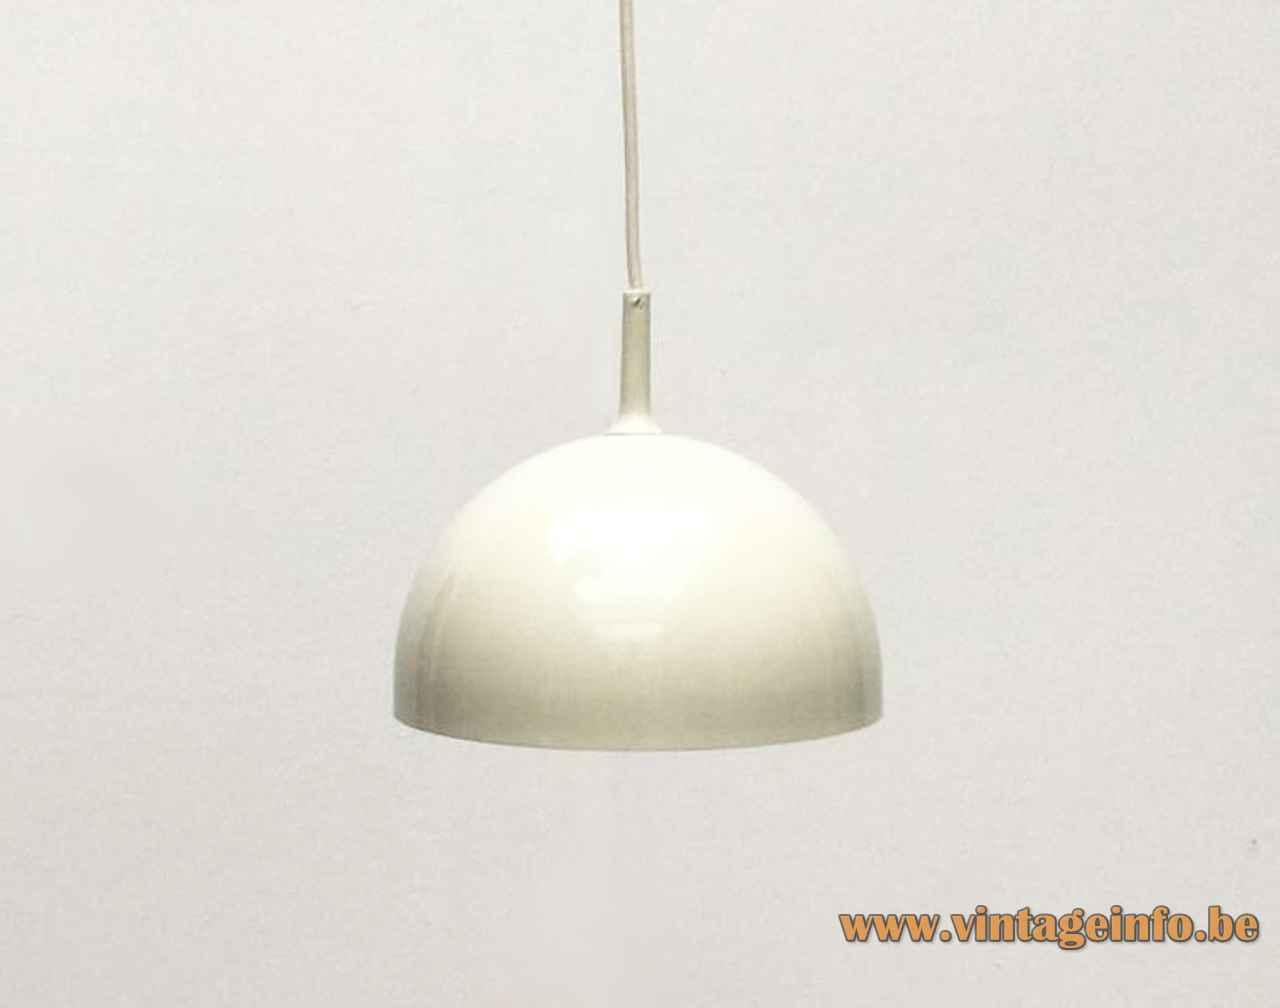 ERCO mushroom pendant lamp ivory metal lampshade white plastic grid 1960s 1970s Germany E27 socket